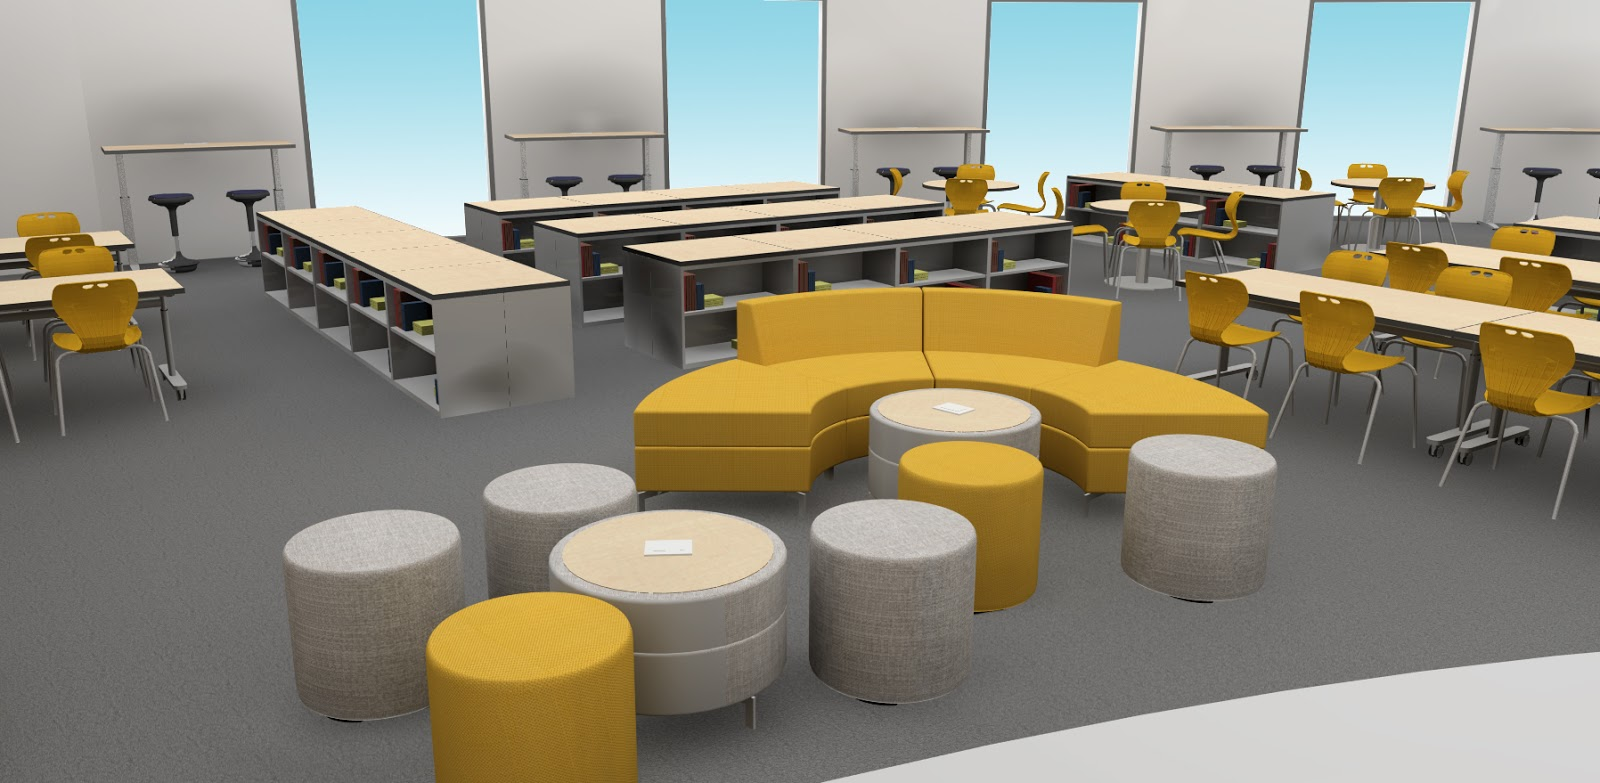 mien classroom 1.jpg